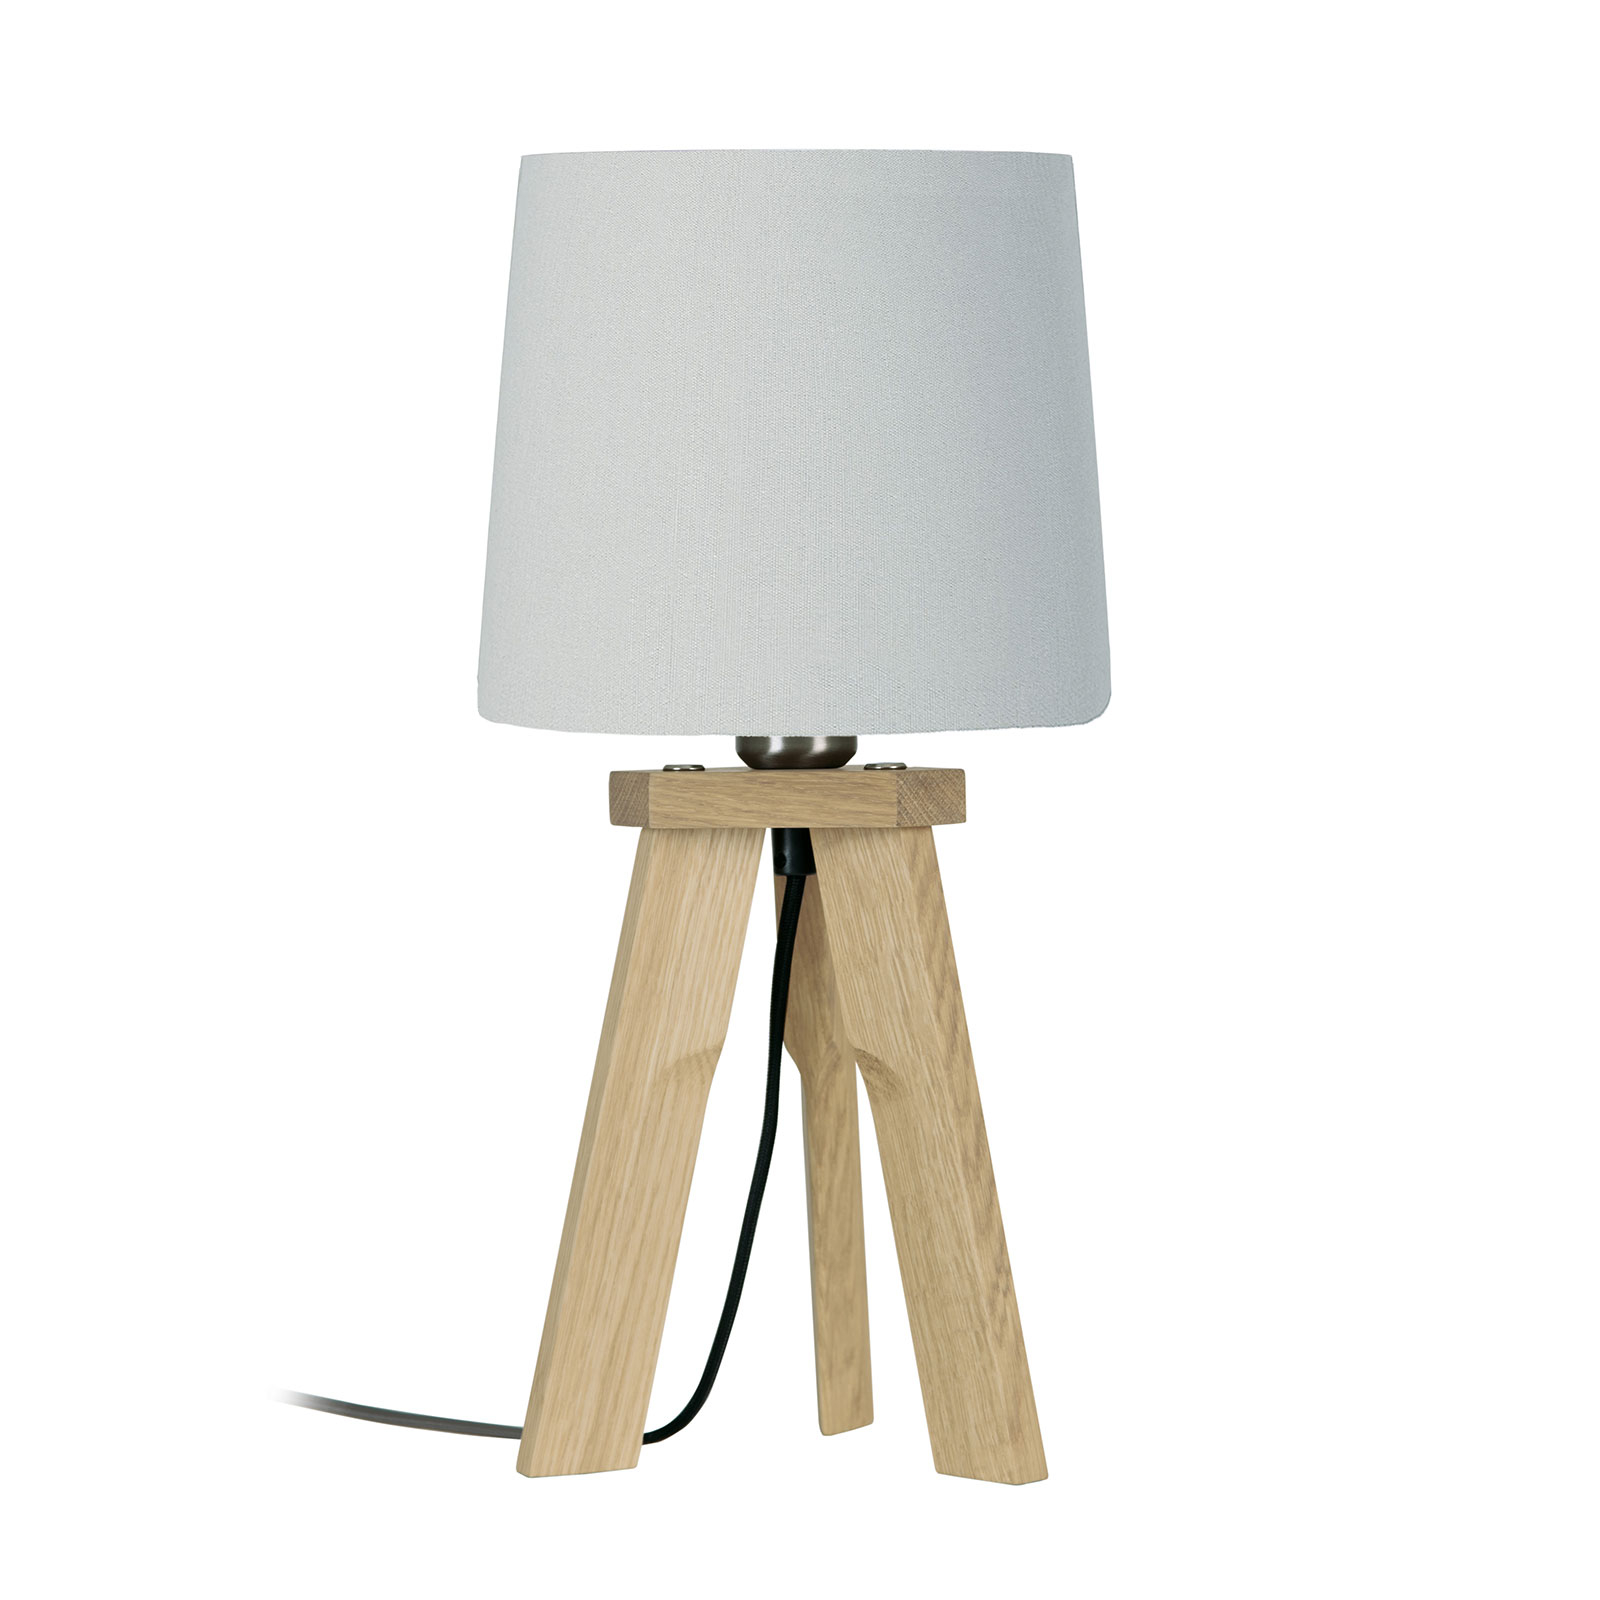 HerzBlut Tre lampe table chêne nat. blanche, 42cm